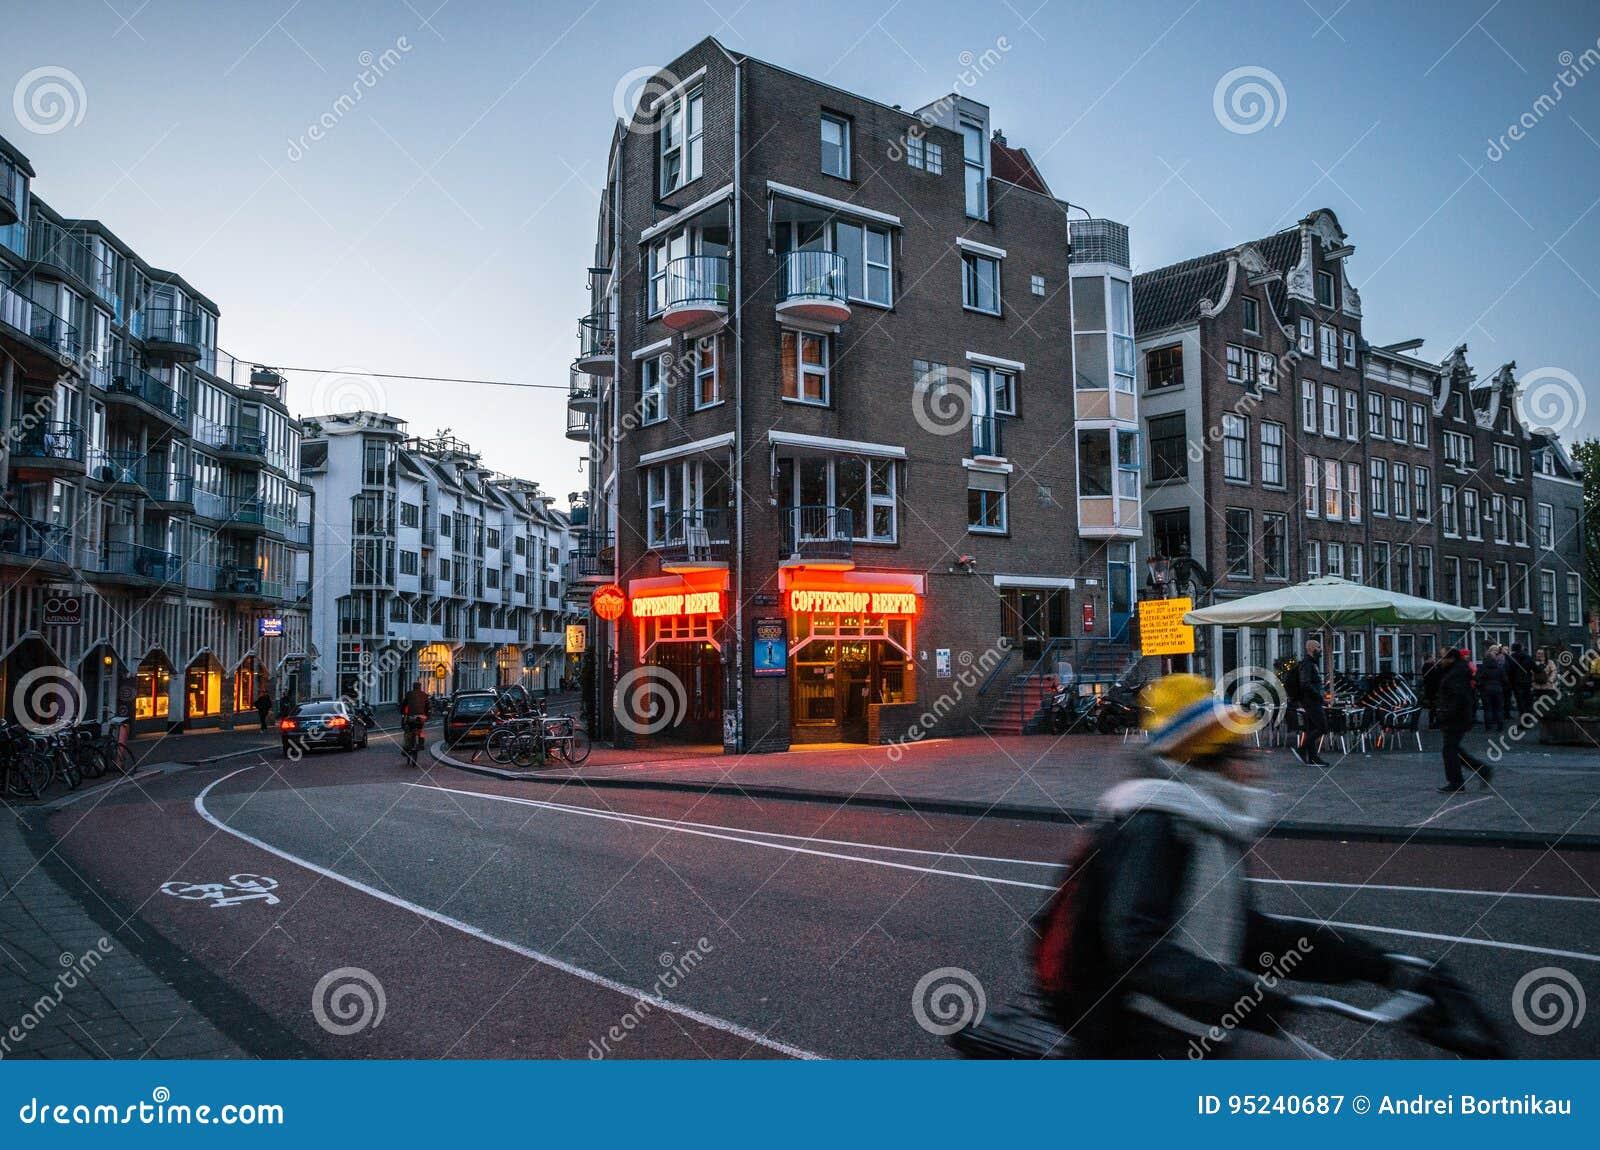 Babes Amsterdam